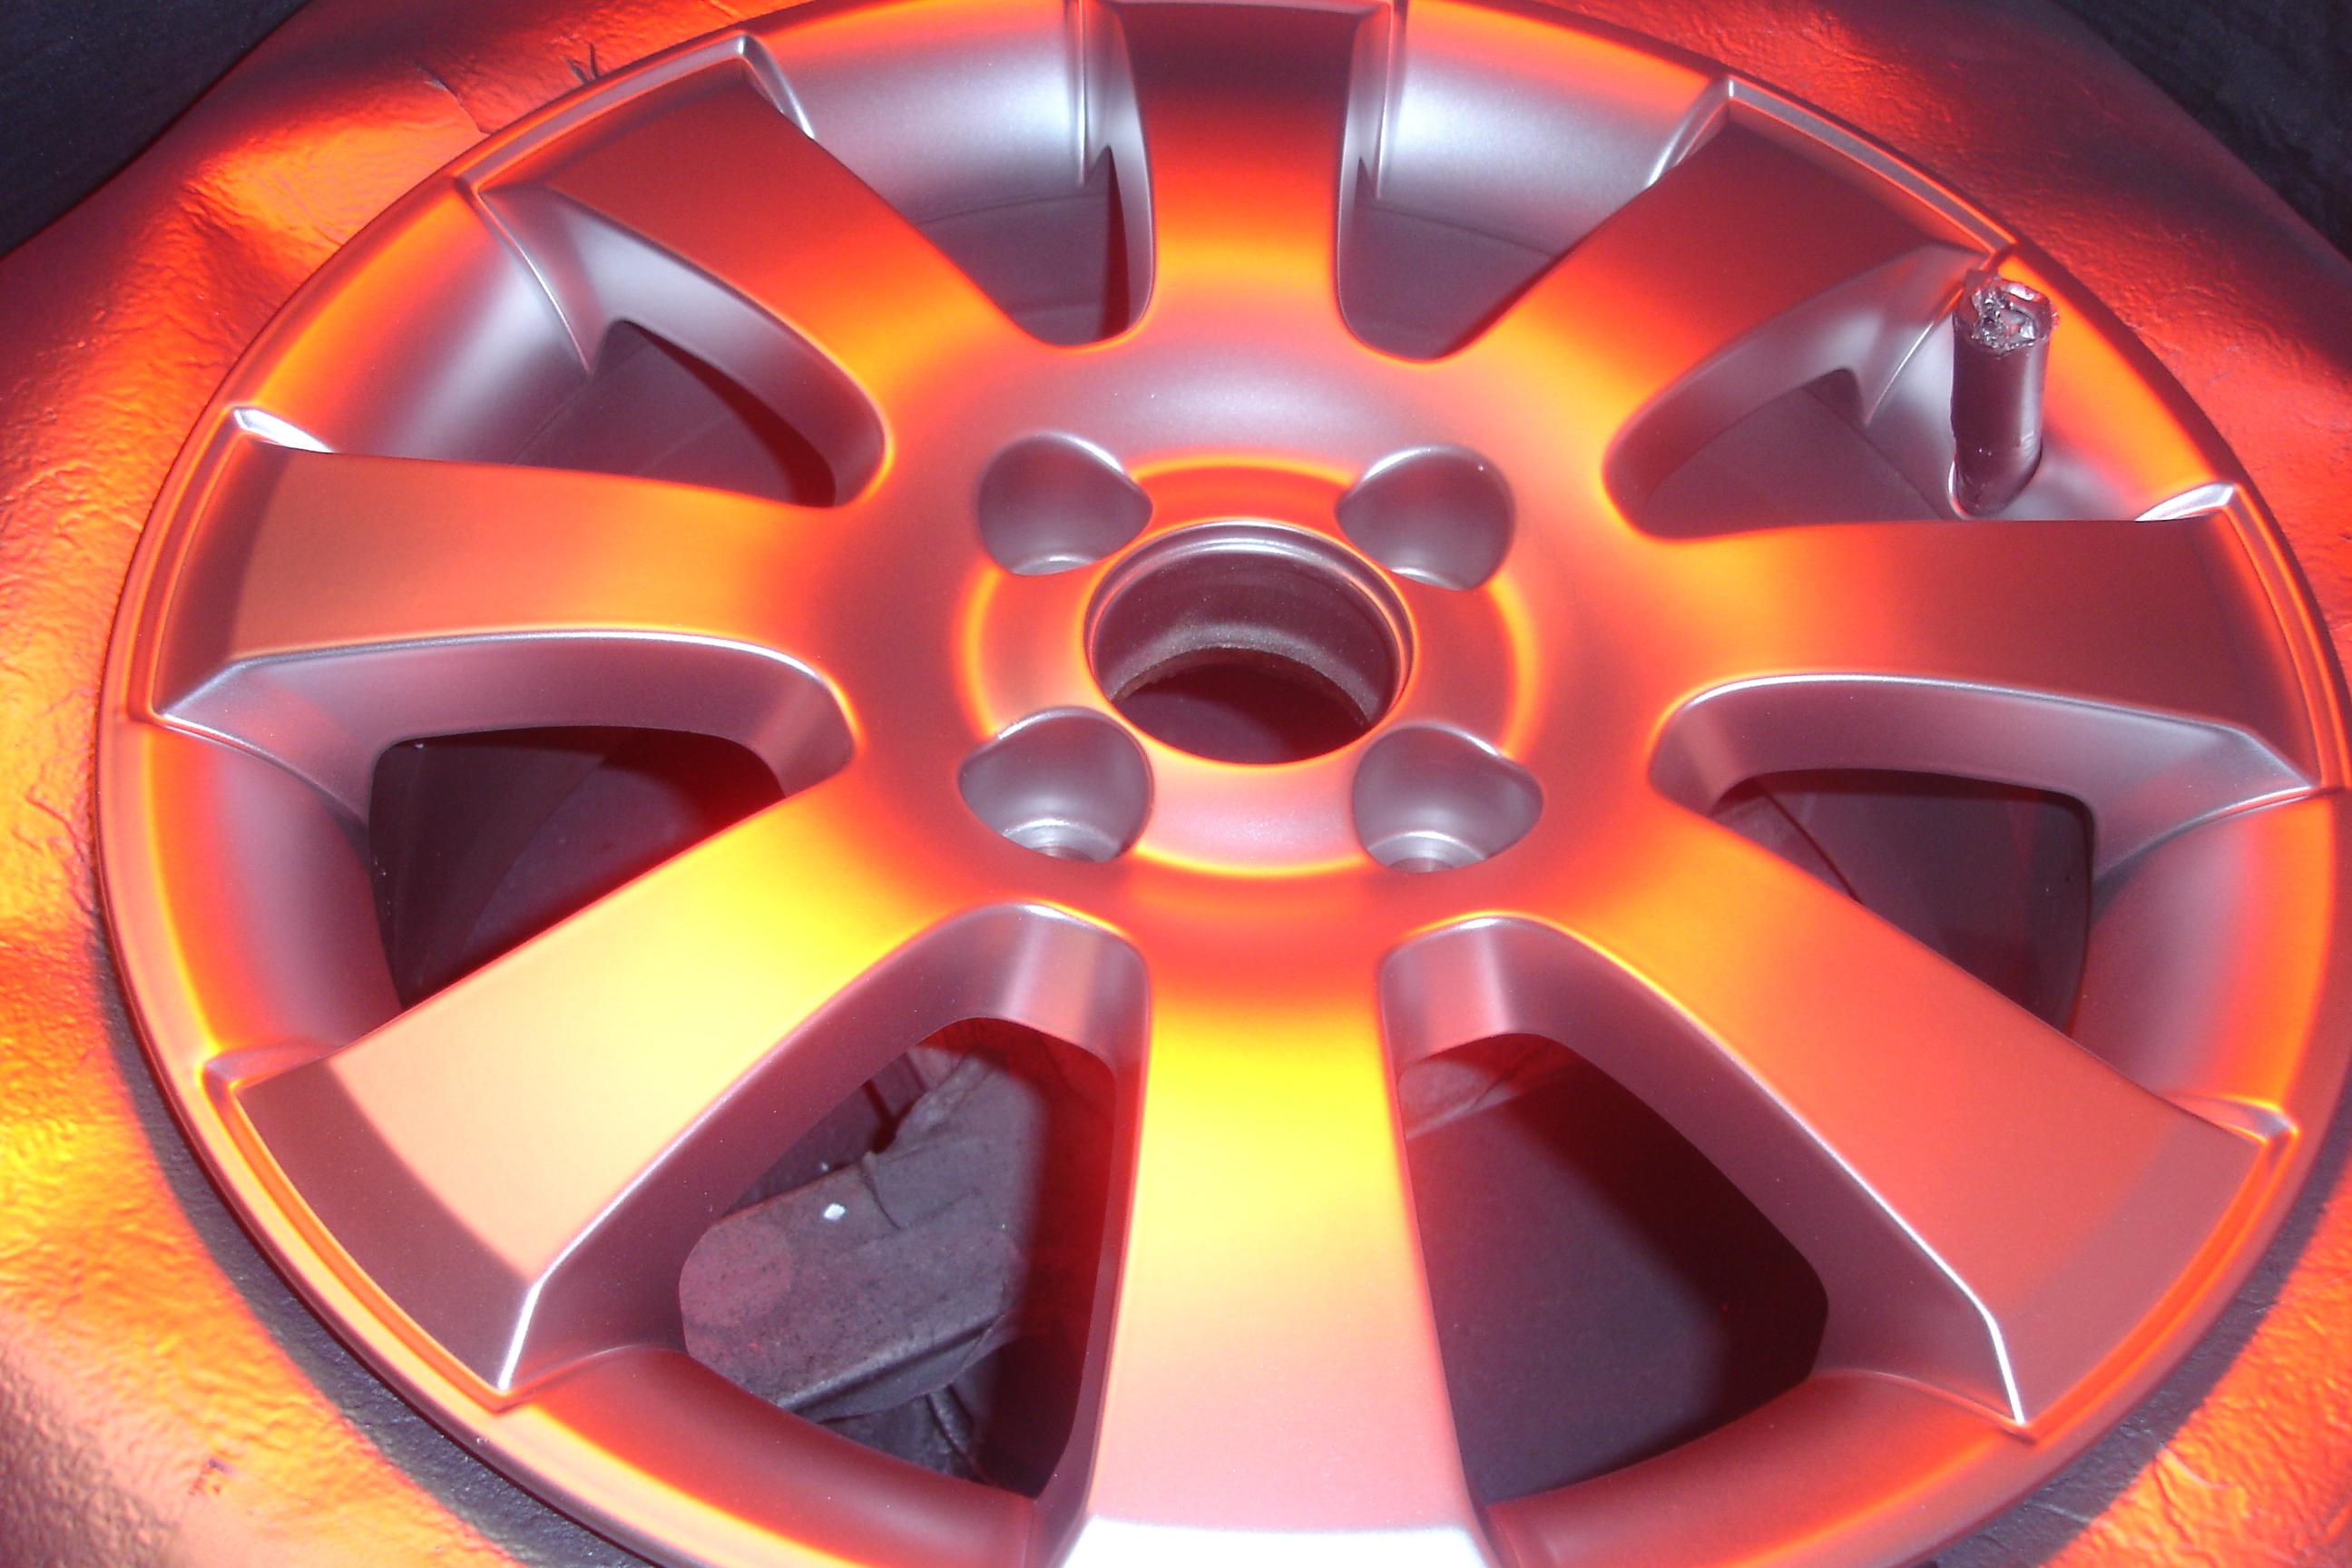 infra-red-baking-paint-finish